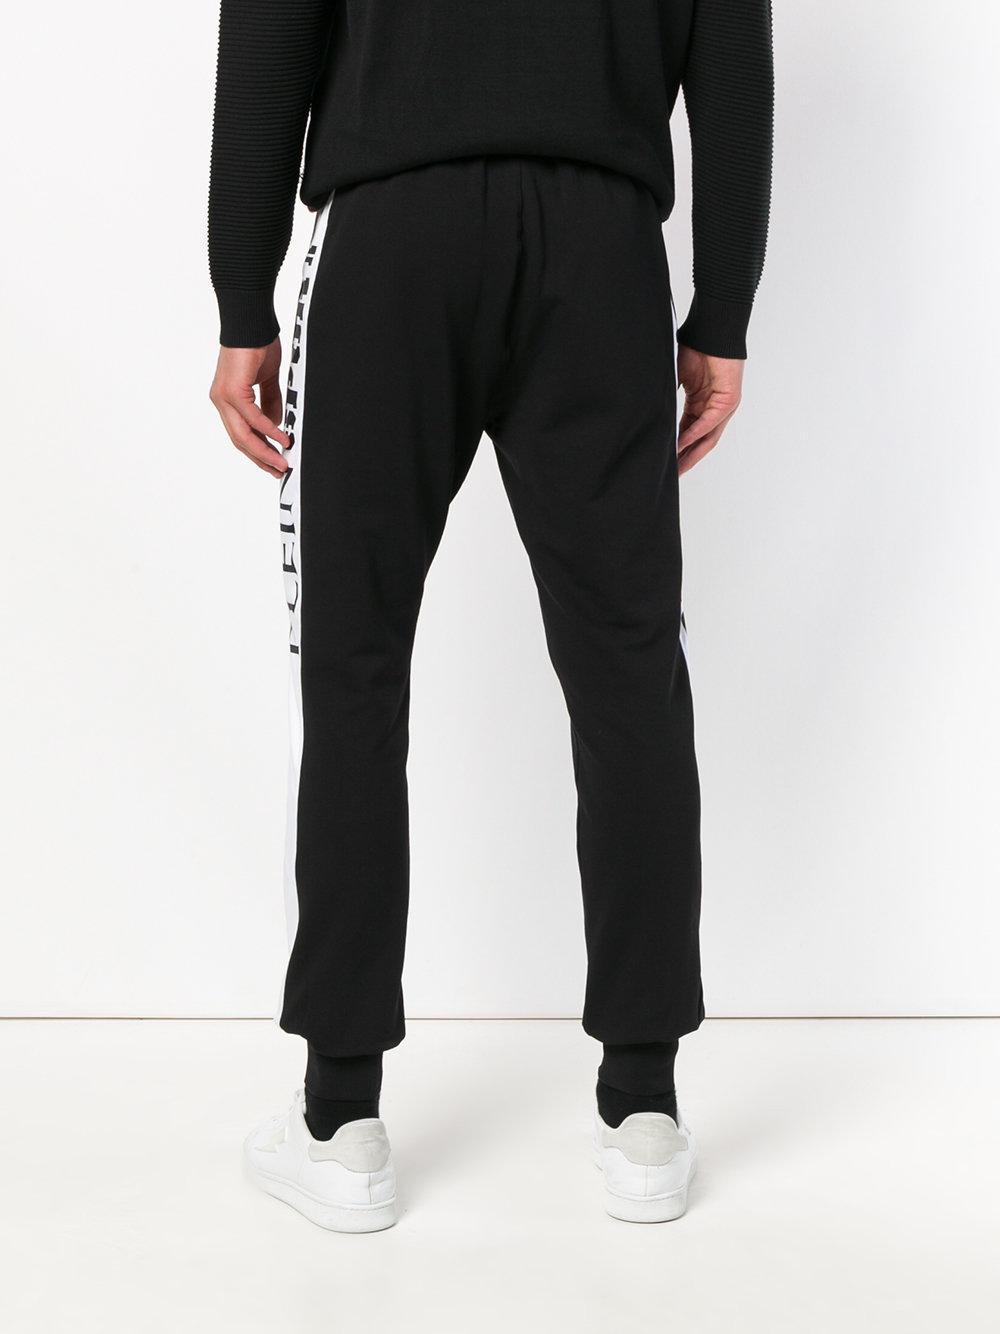 Philipp Plein Cotton Logo Track Pants in Black for Men